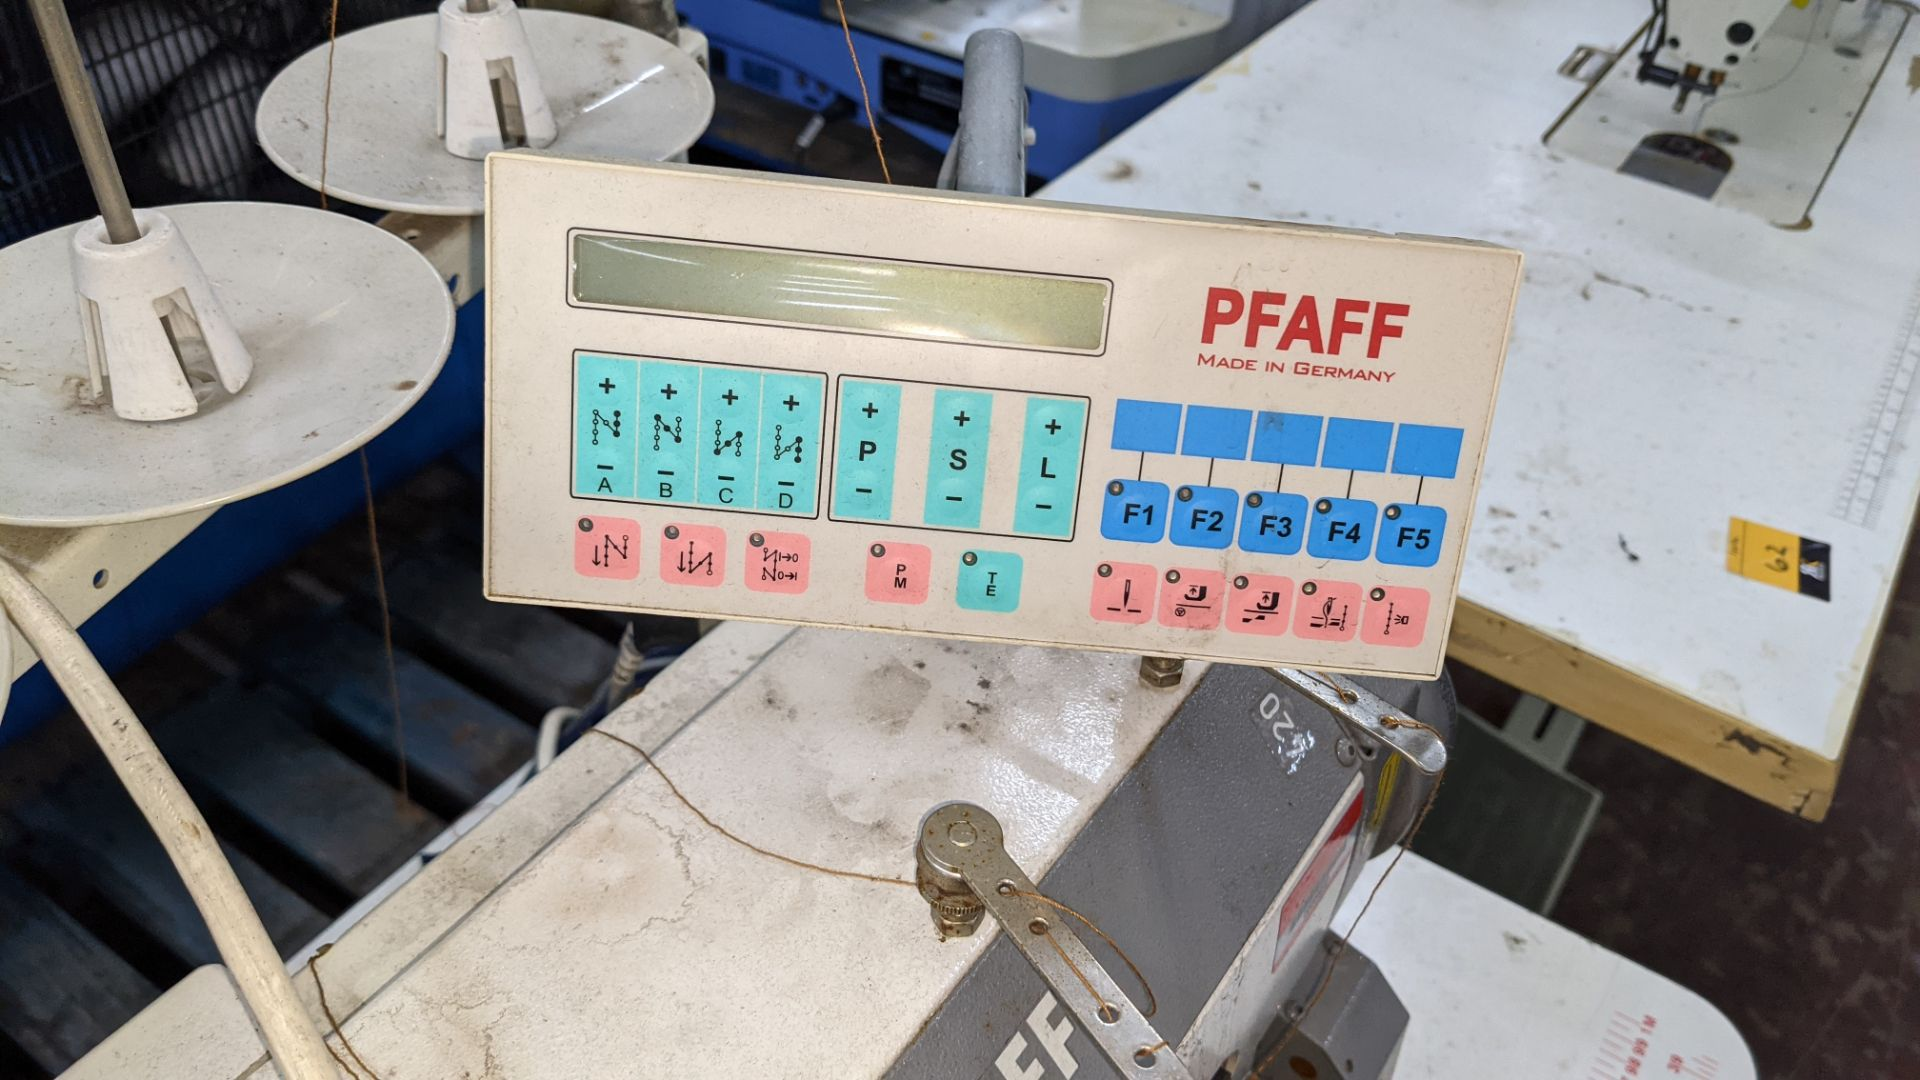 Pfaff twin needle sewing machine, model 422 - Image 9 of 17